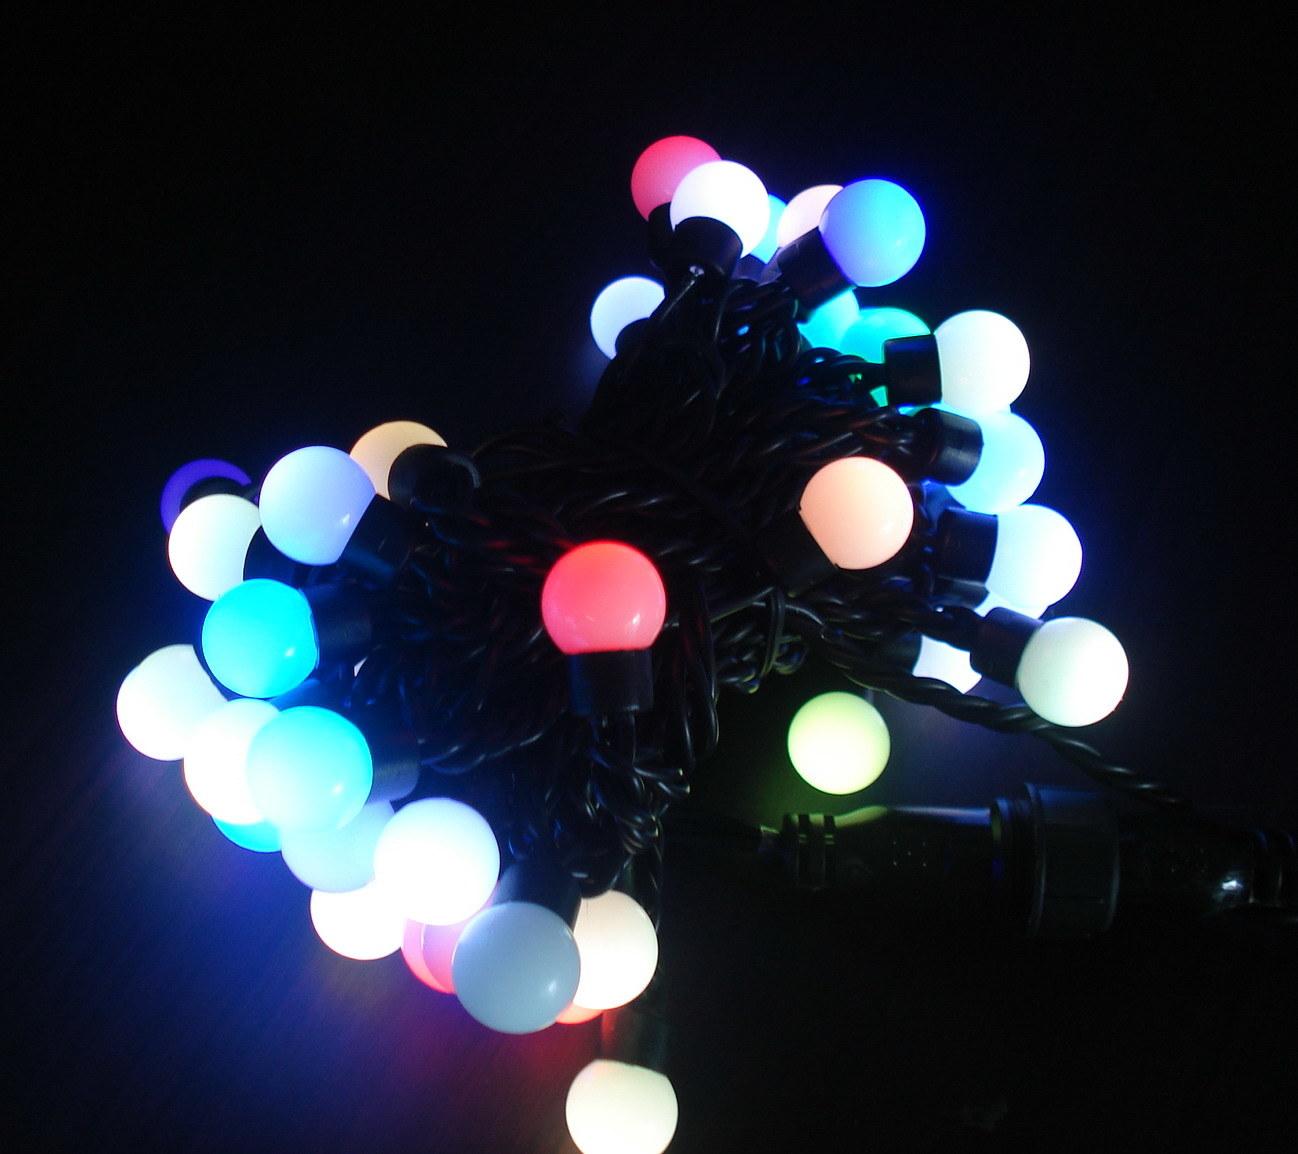 String Lights With Round Bulbs : China RGB LED String Light with Round Bulb, IP65 - China Light String, String Light